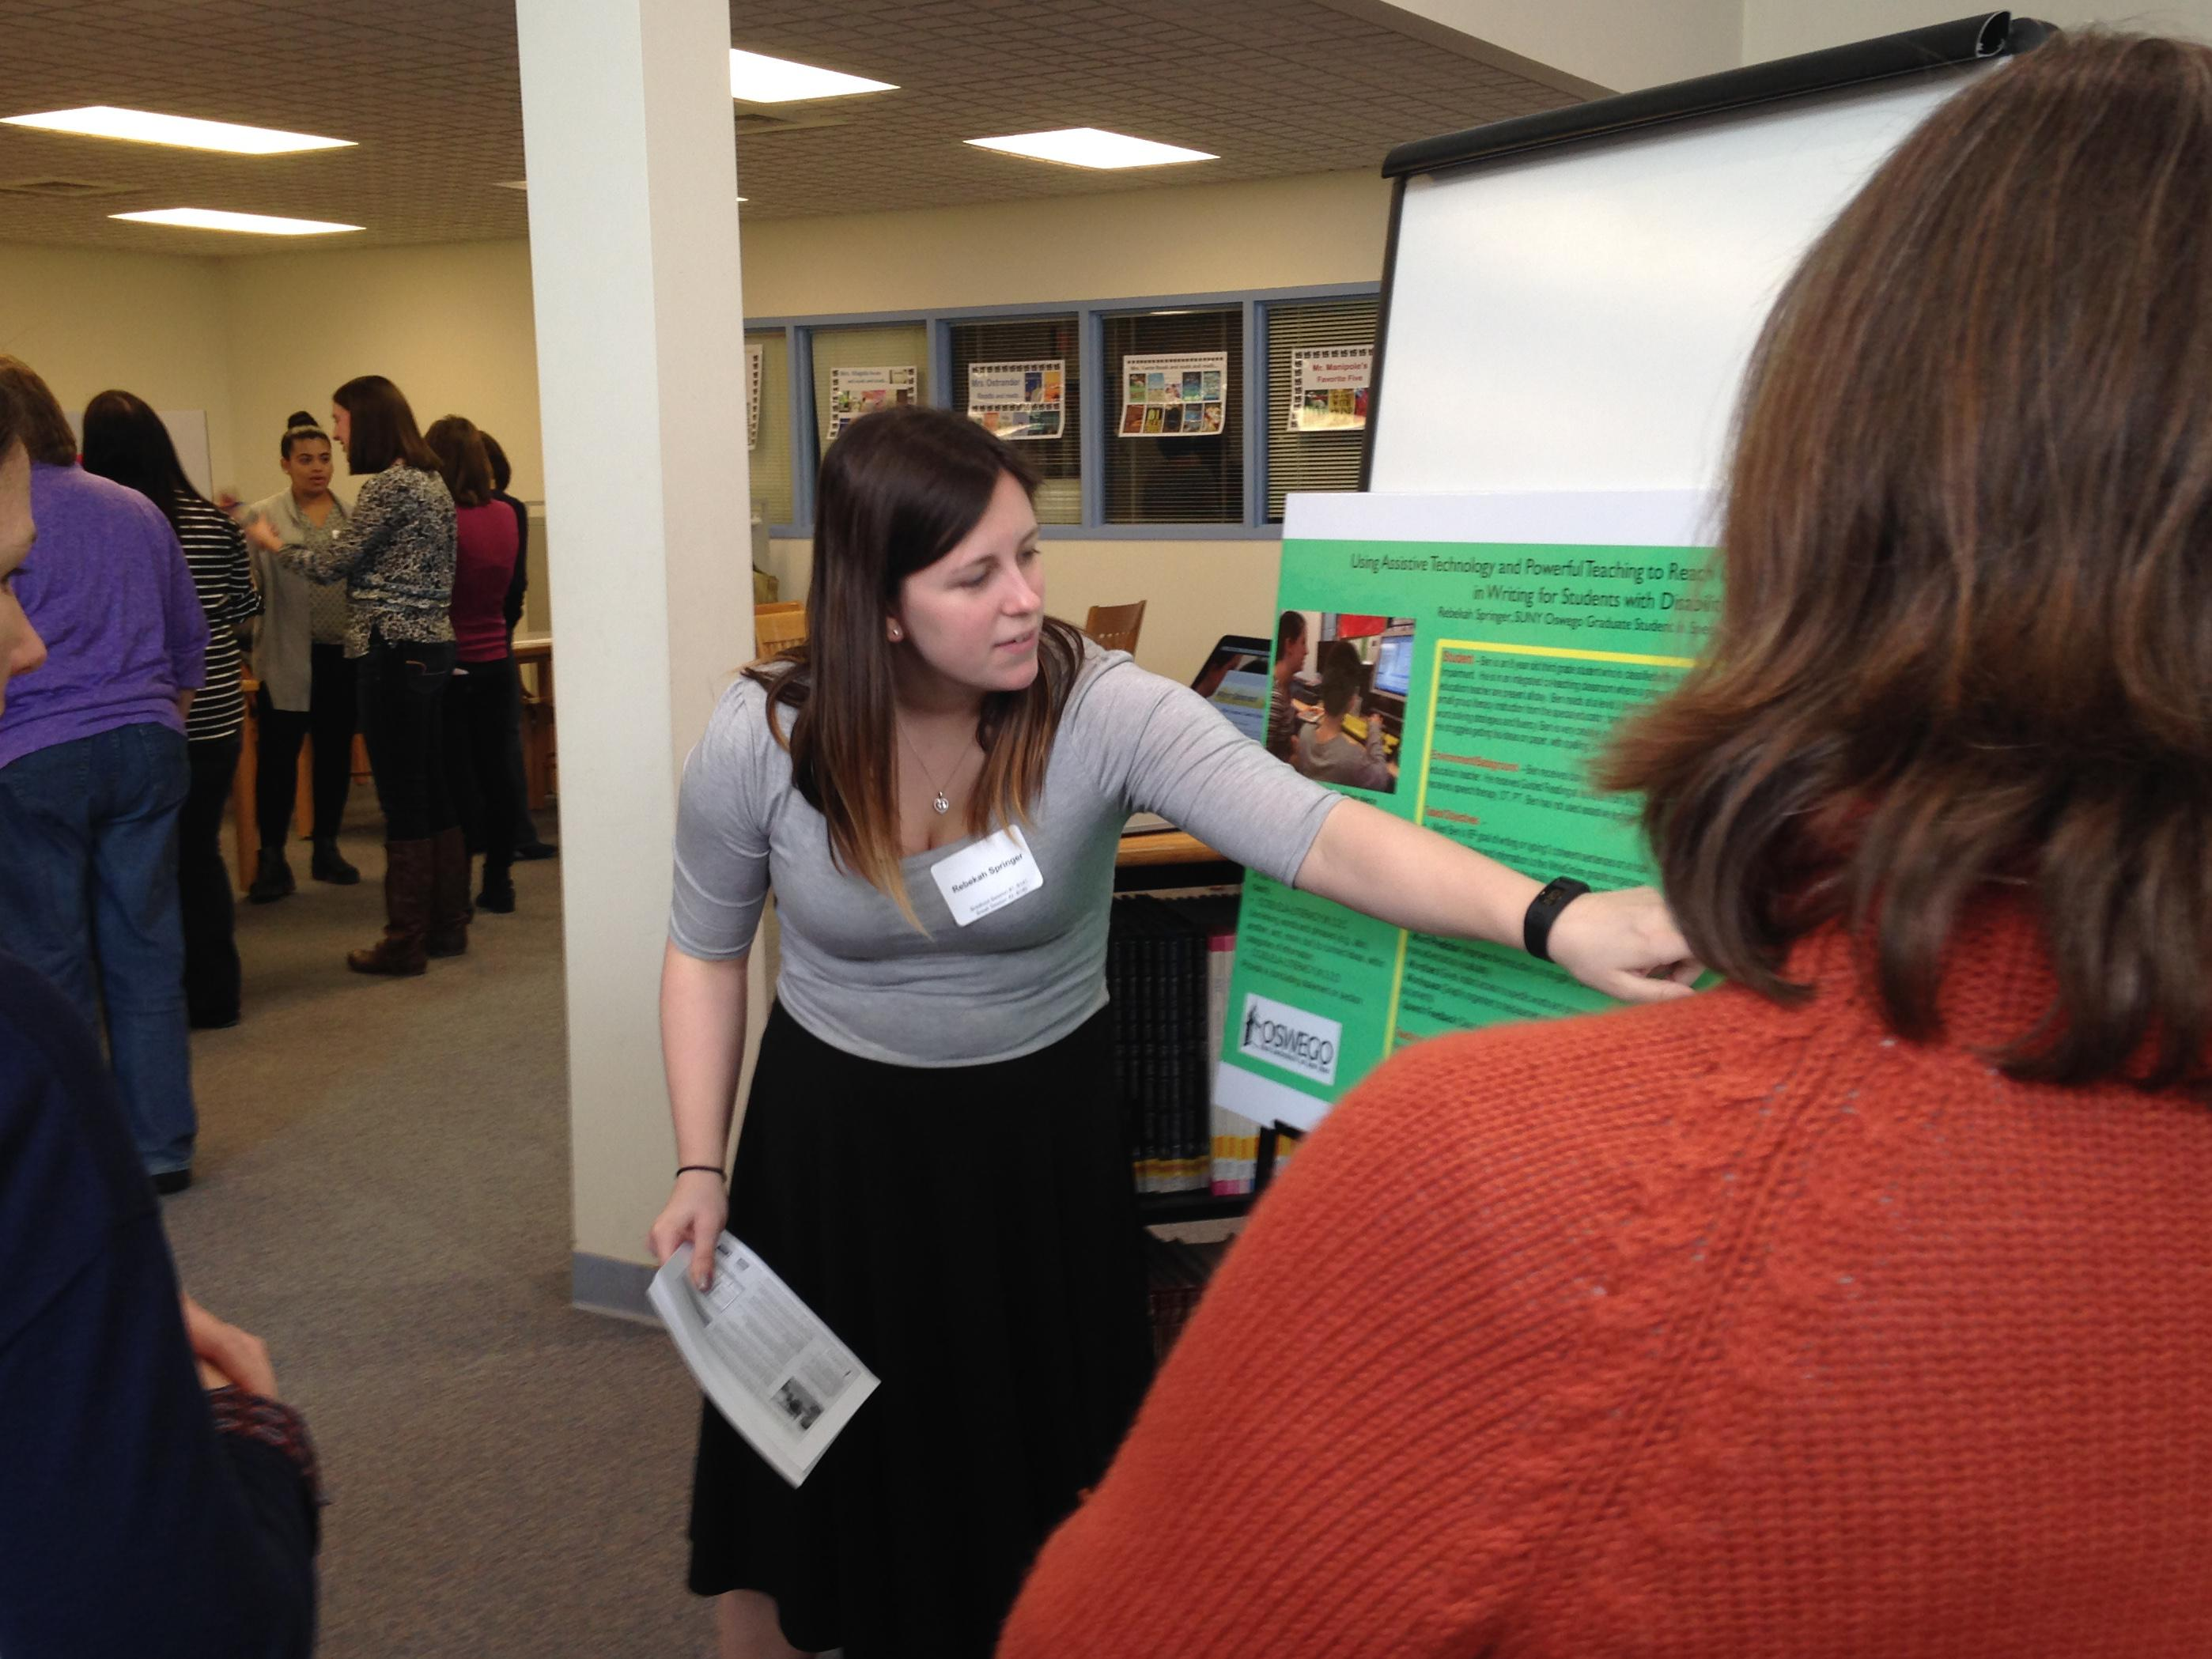 Rebekah Springer presenting